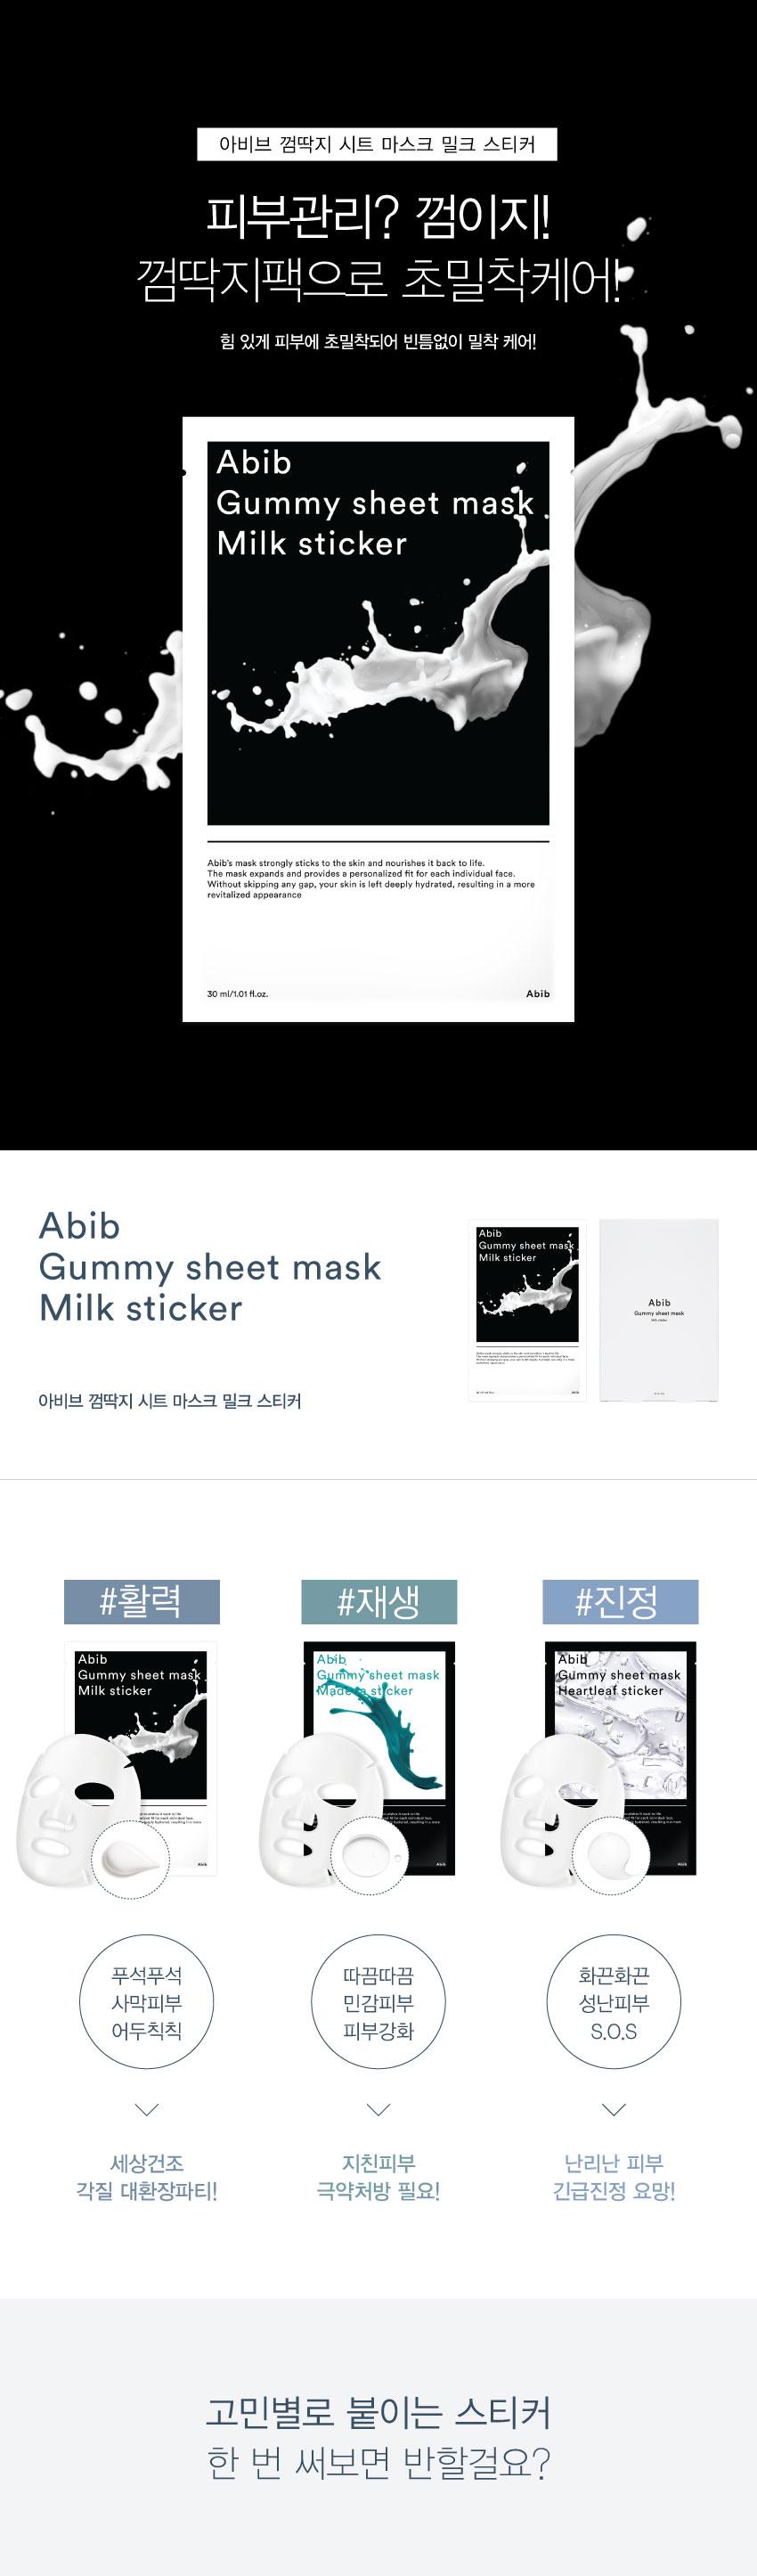 abib-mask.jpg